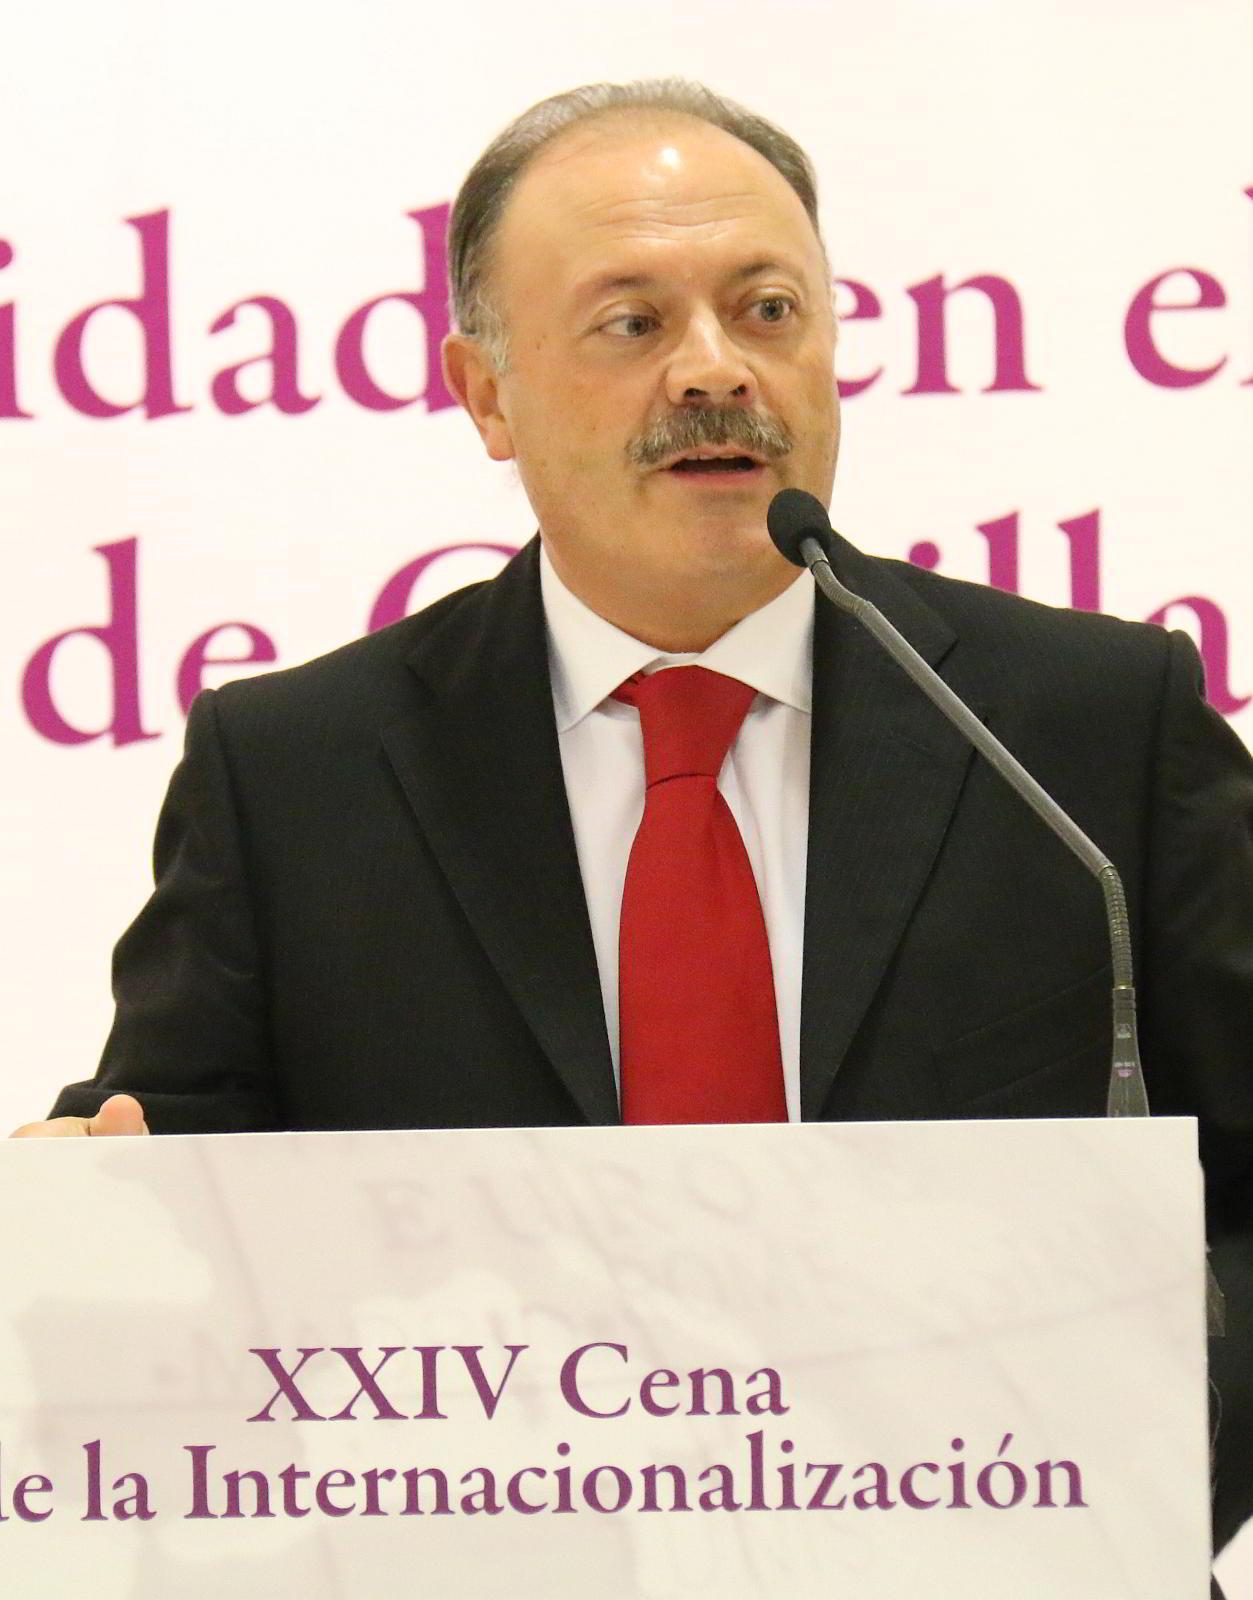 XXIV Cena Internacionalizacion